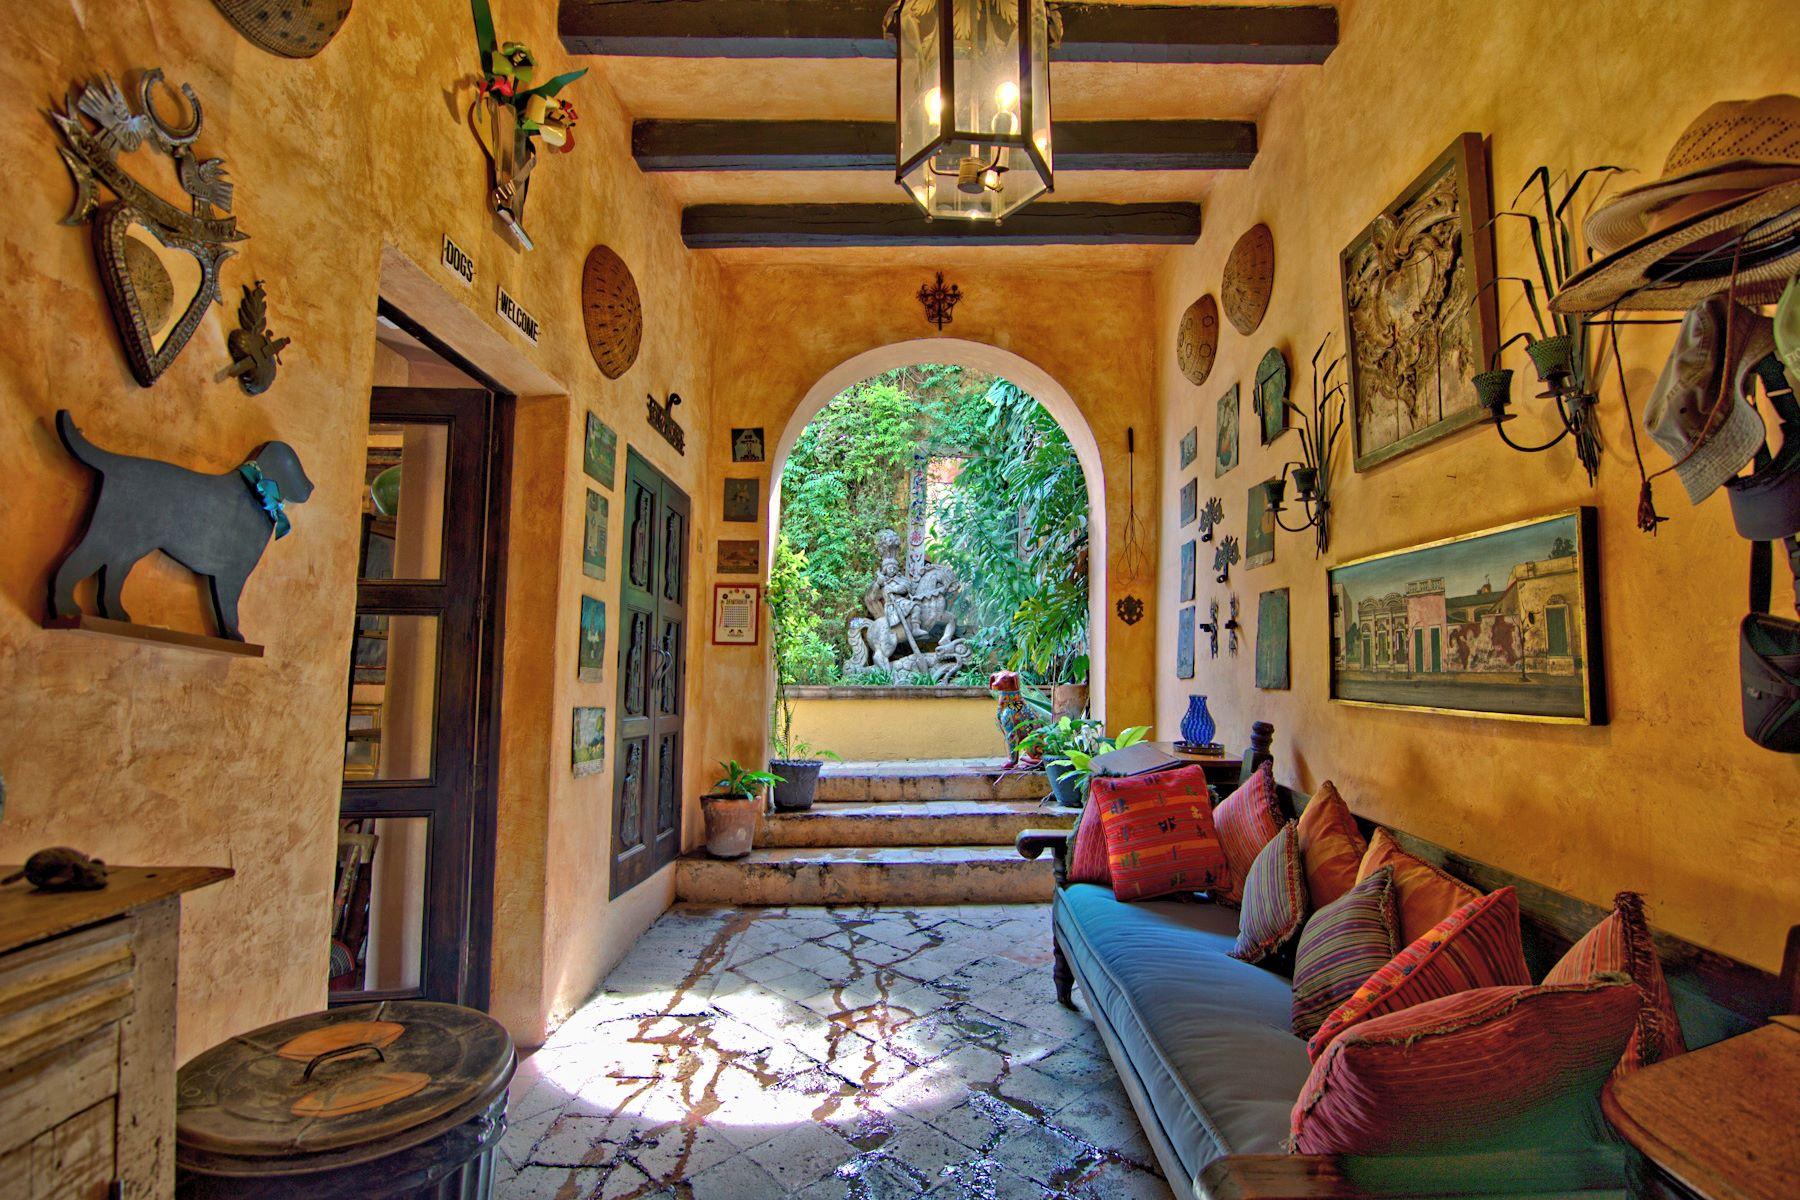 Villa per Vendita alle ore Casa Colonial Salida a Queretaro 40 San Miguel De Allende, Guanajuato, 37700 Messico